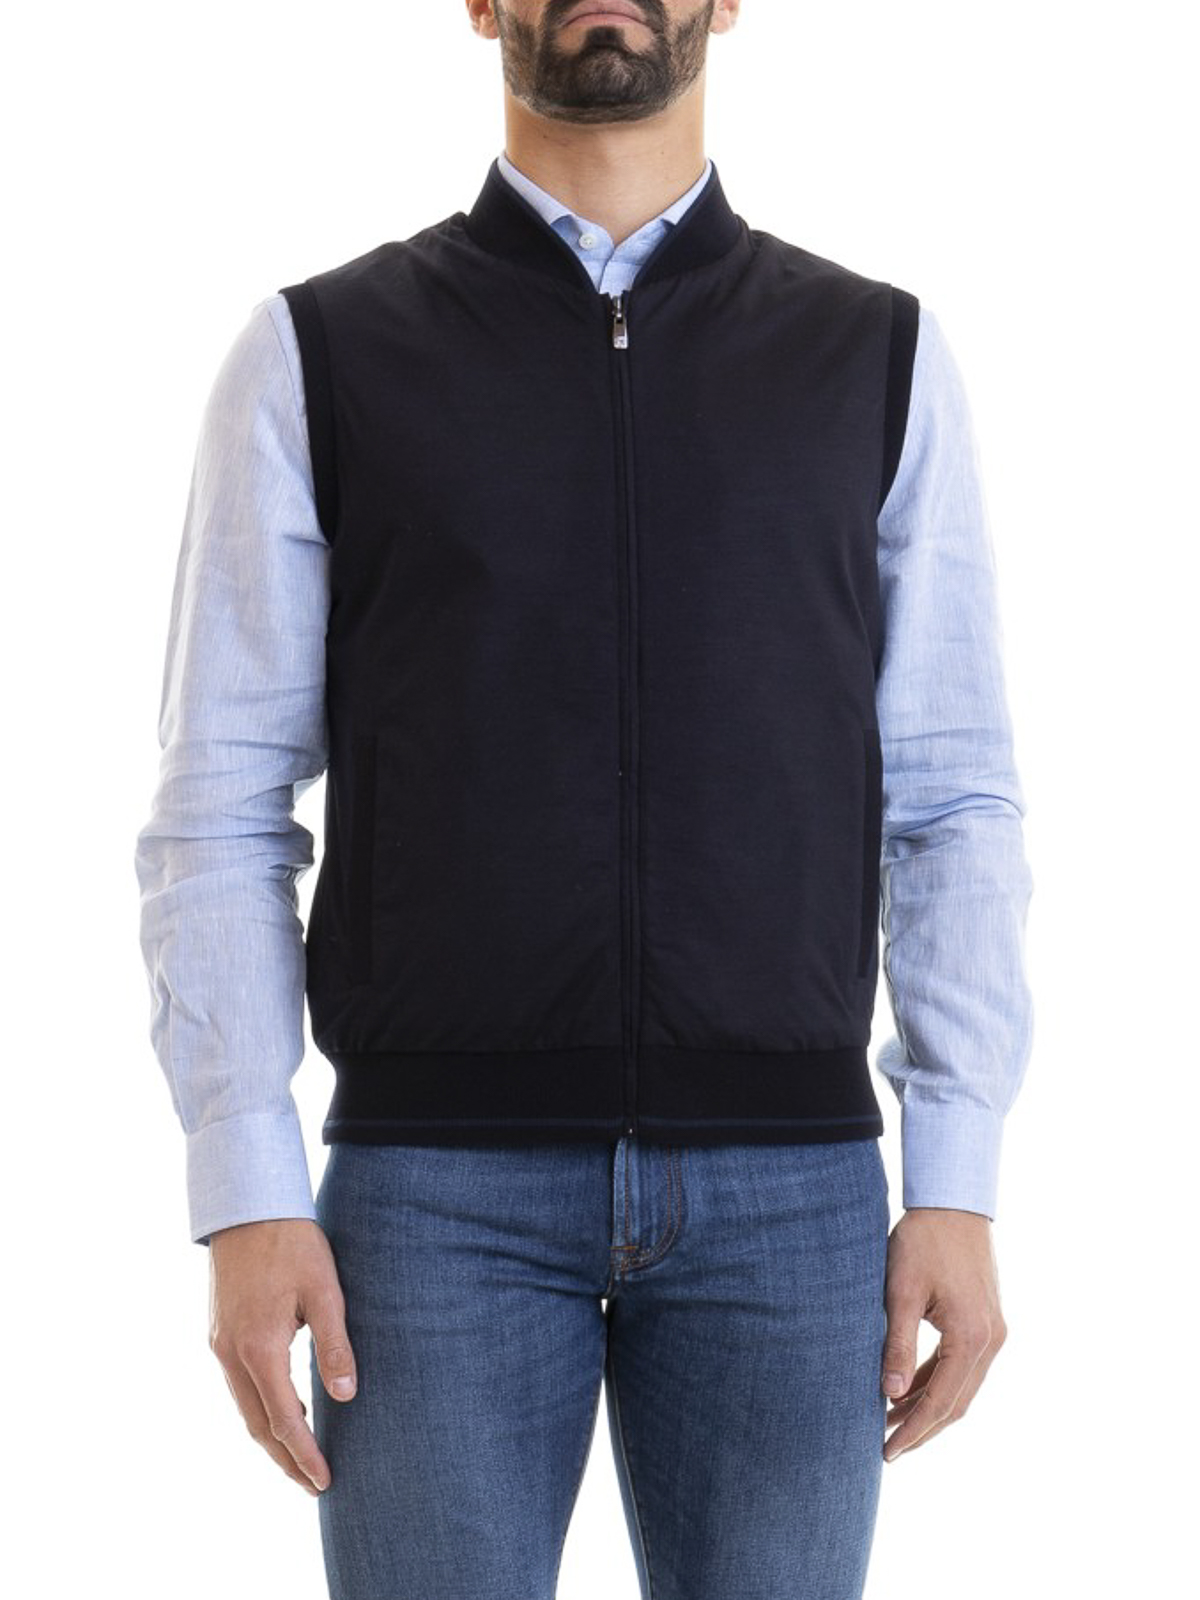 3597d4604e Corneliani - Wool jersey and nylon vest - waistcoats & gilets ...